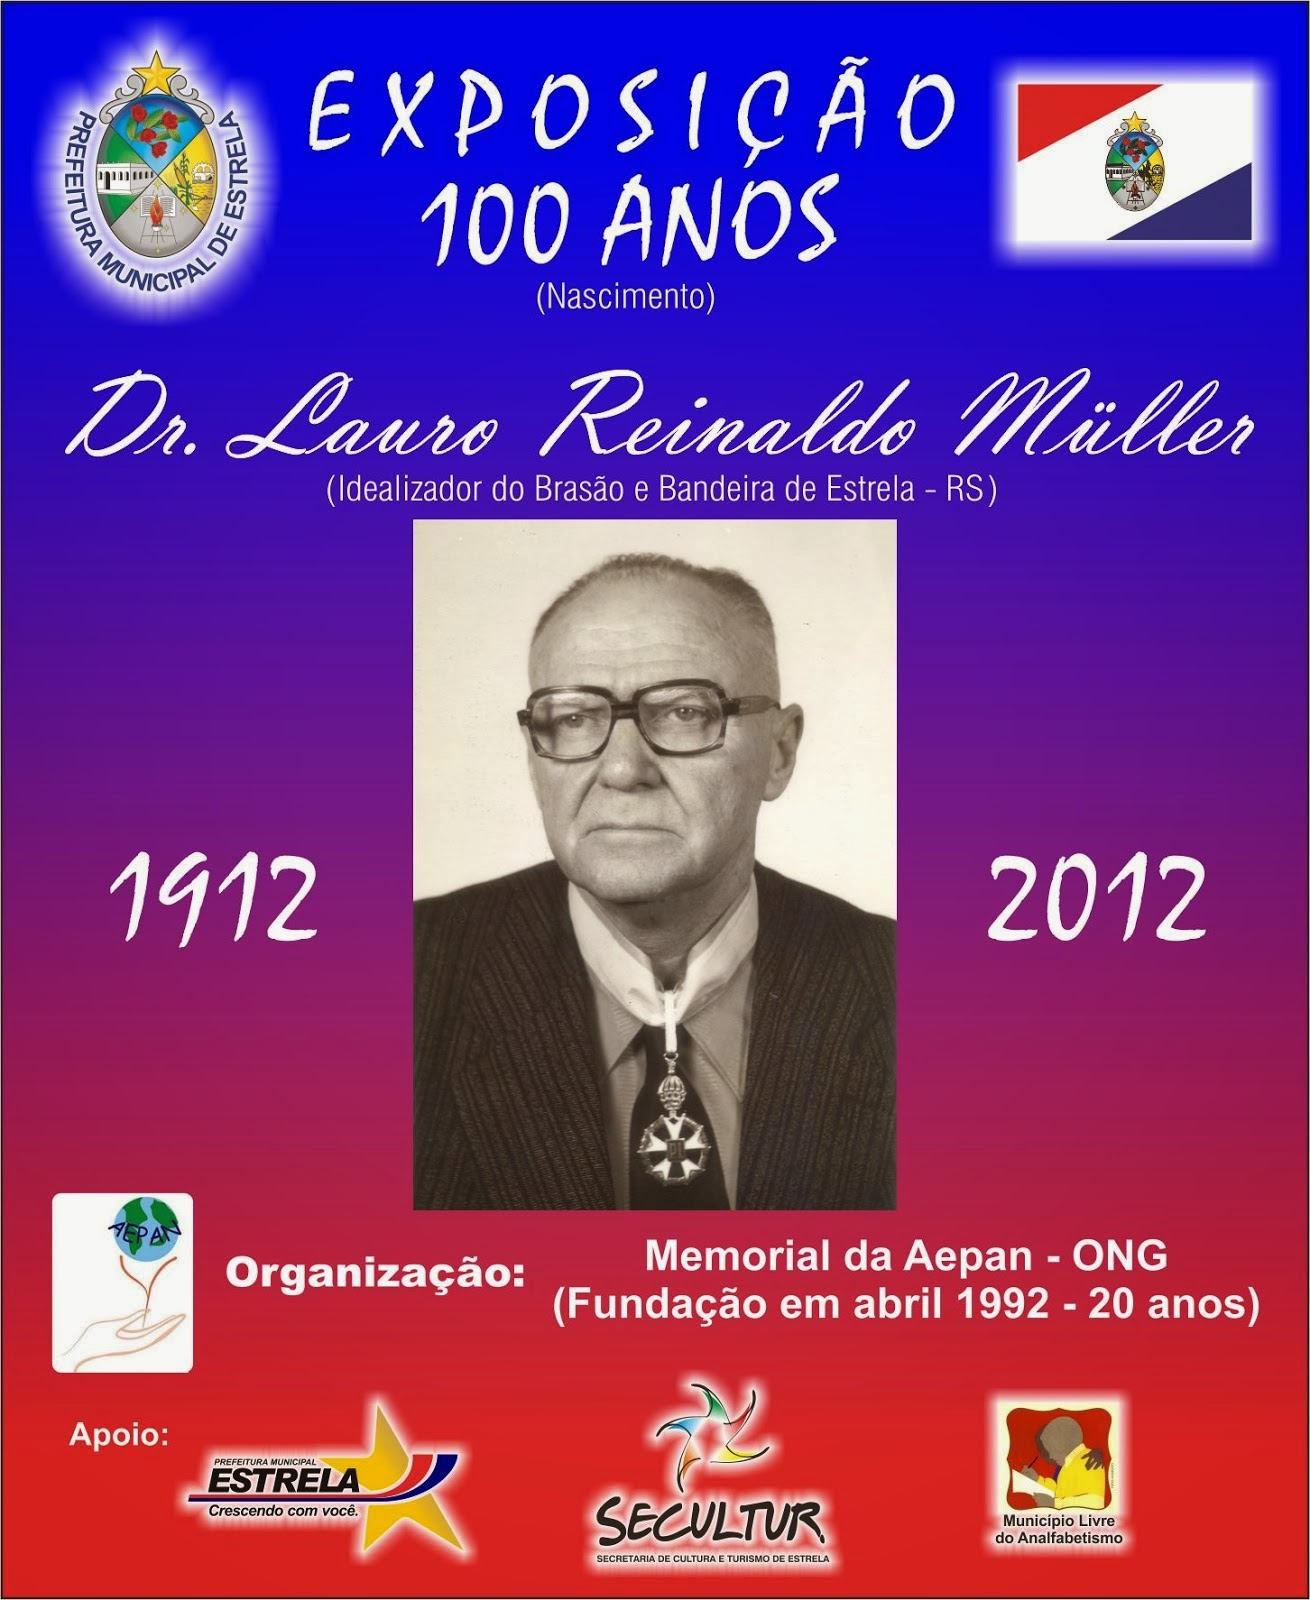 Dr. Lauro Reinaldo Muller